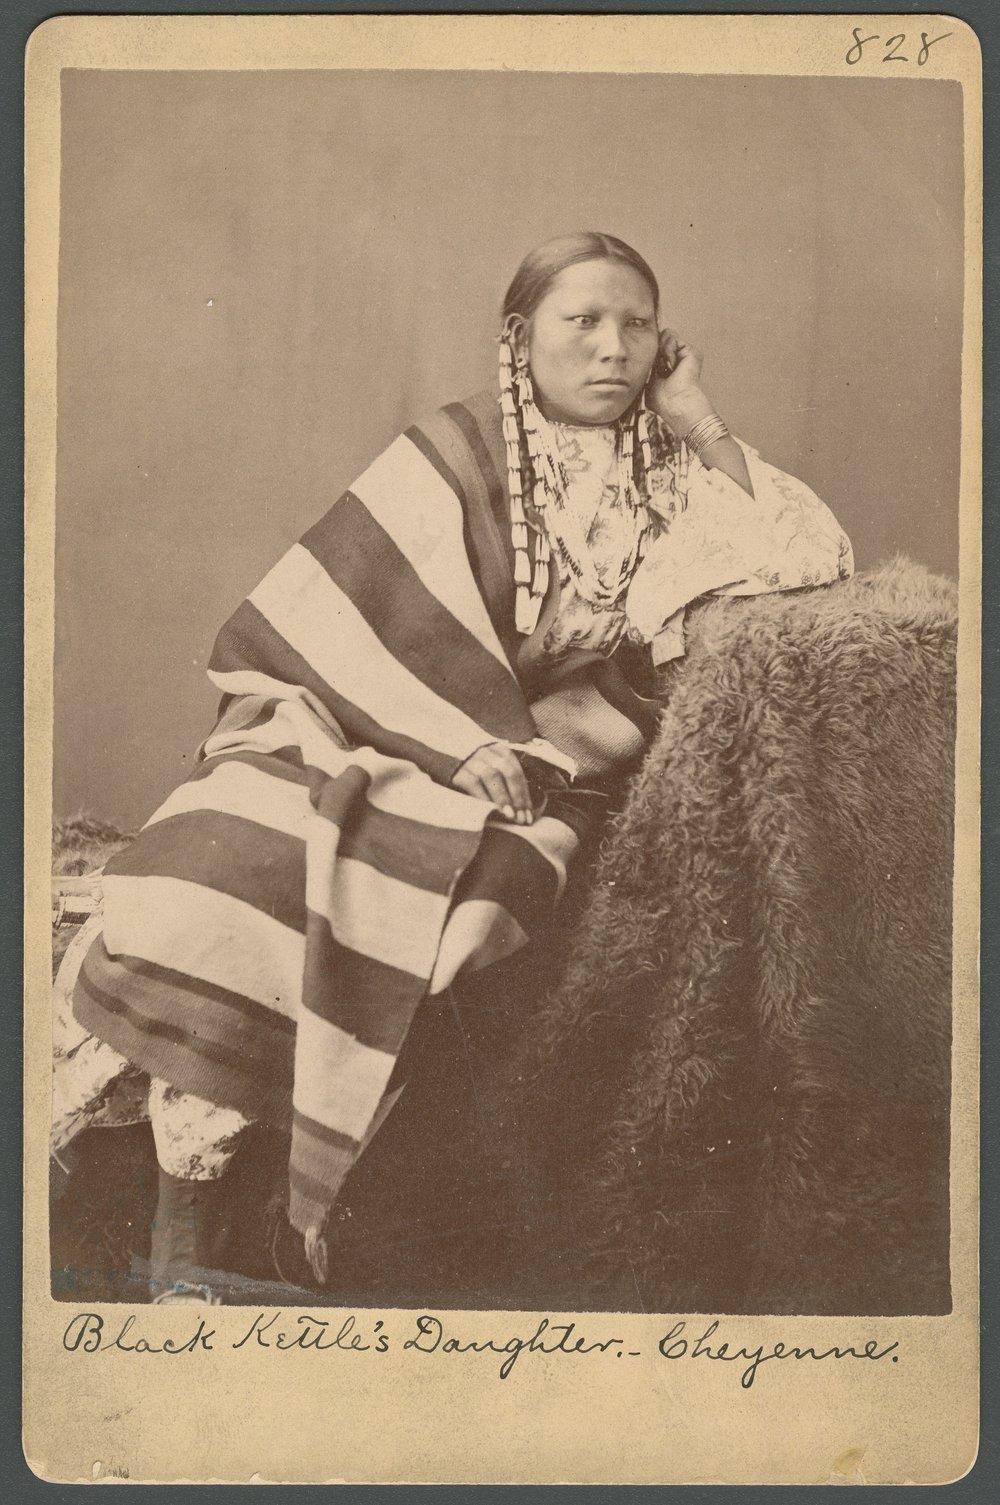 Black Kettle's daughter, Cheyenne, in Indian Territory - 1